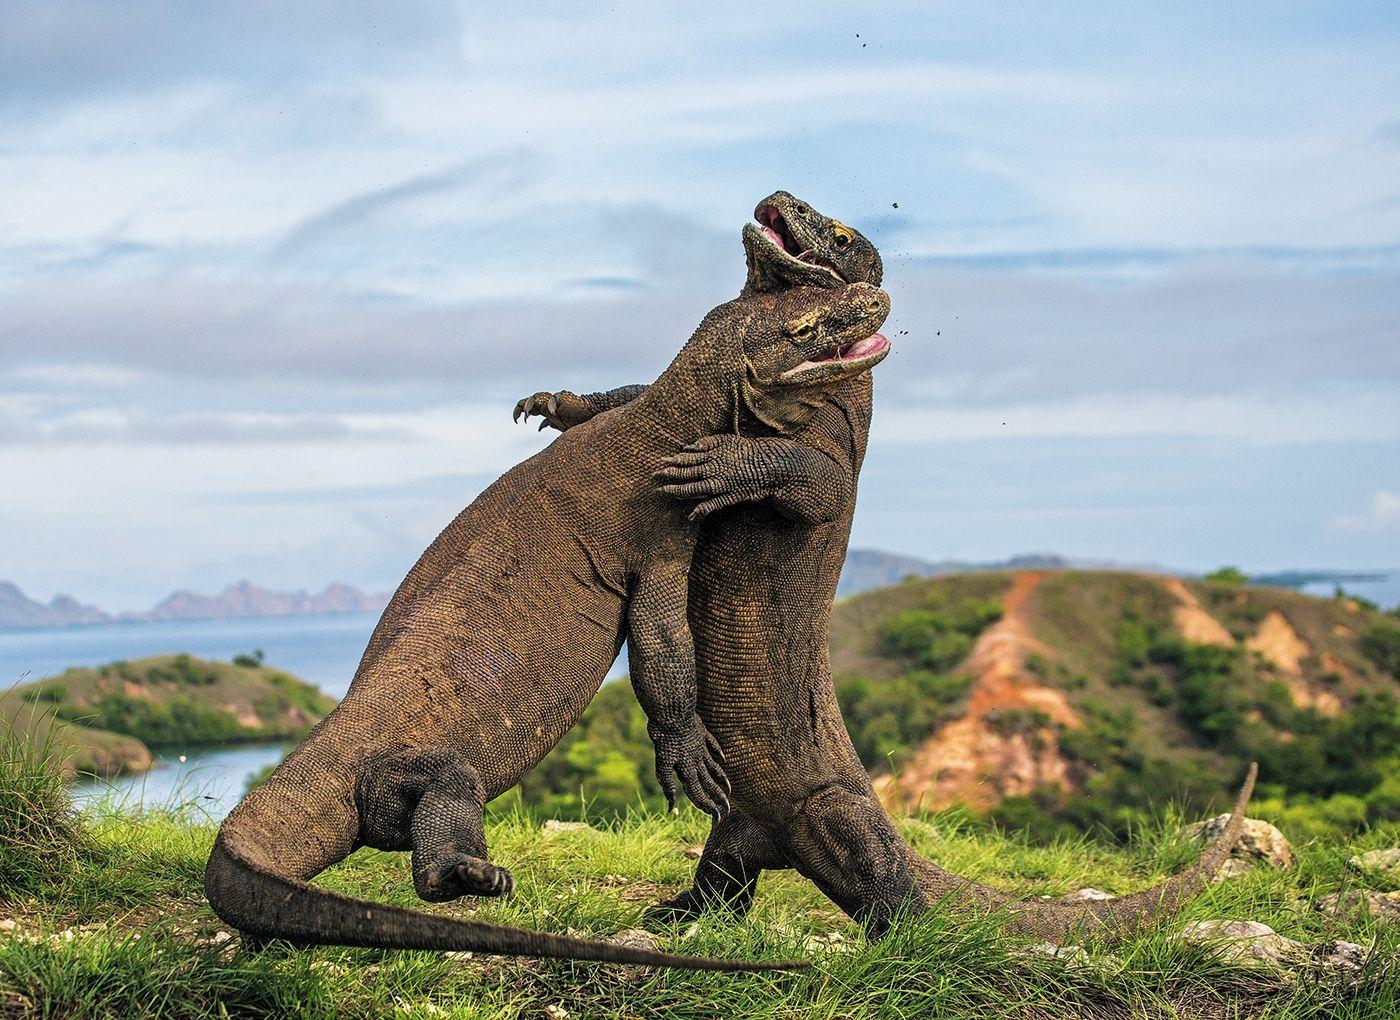 the biggest lizards on earth u2014 komodo dragons u2014 stage brutal